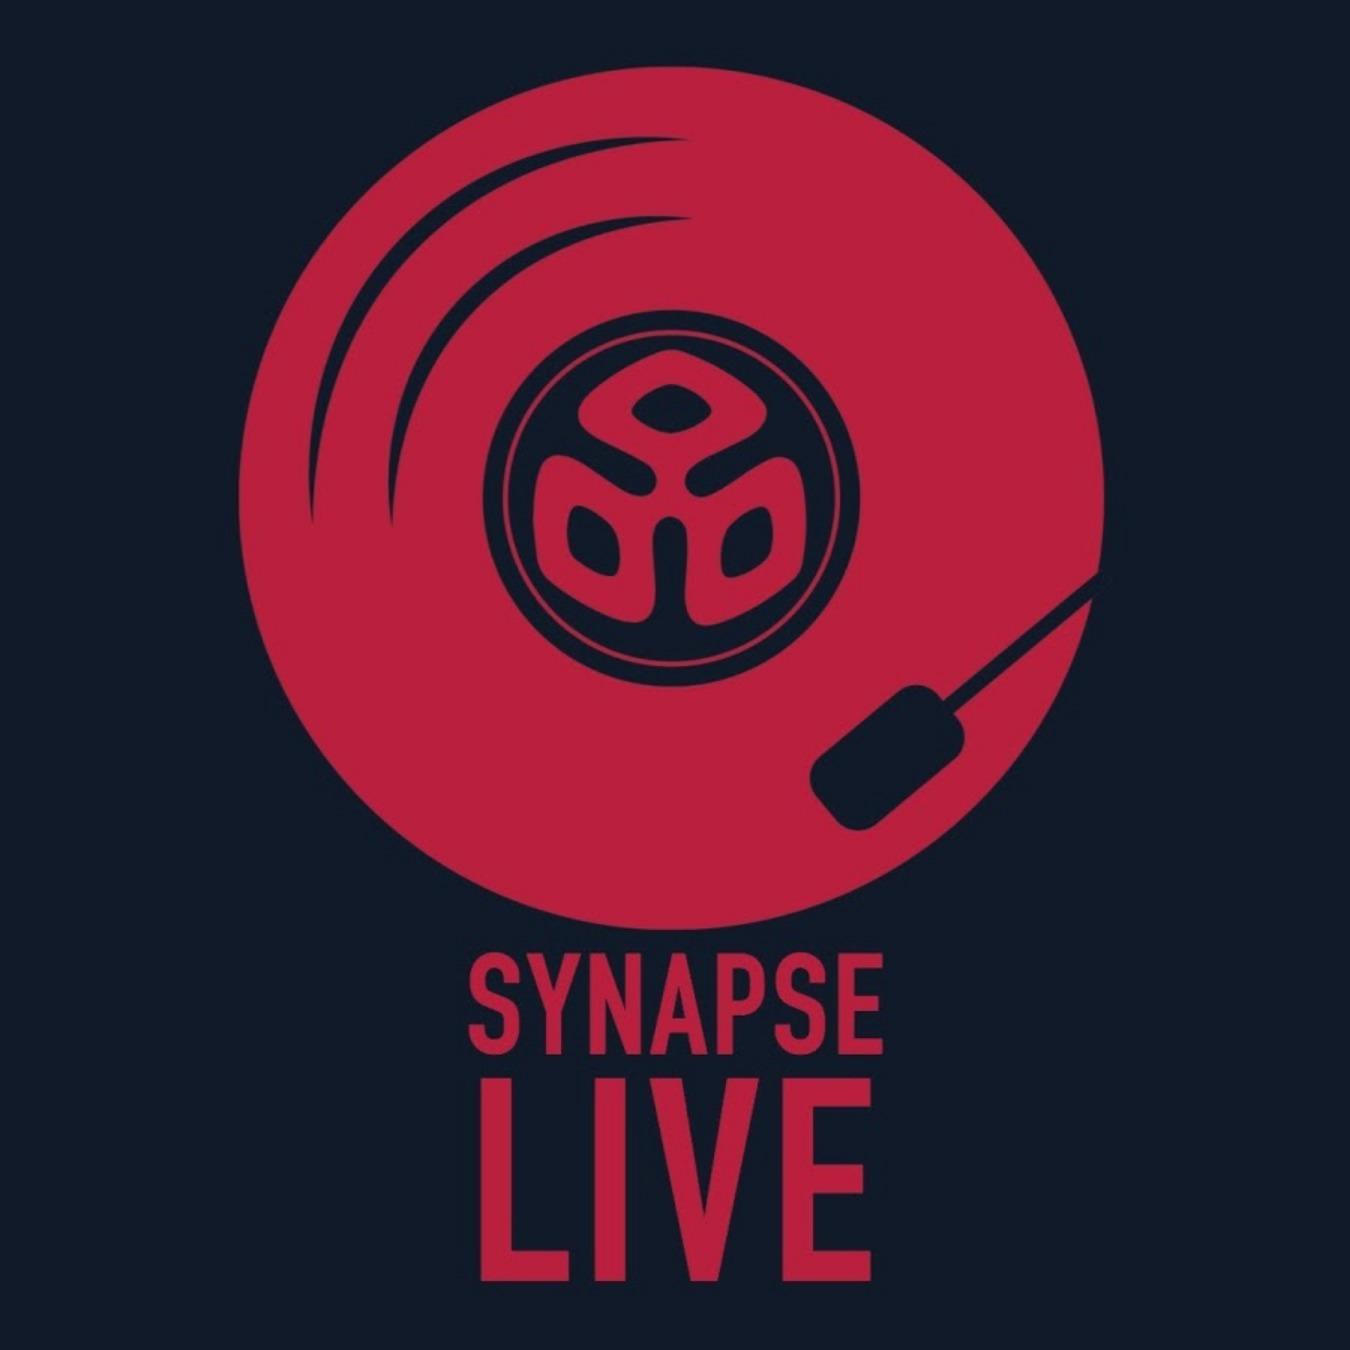 Synapse Tickets by synapse, 21 Feb, 2019, Gandhinagar Event